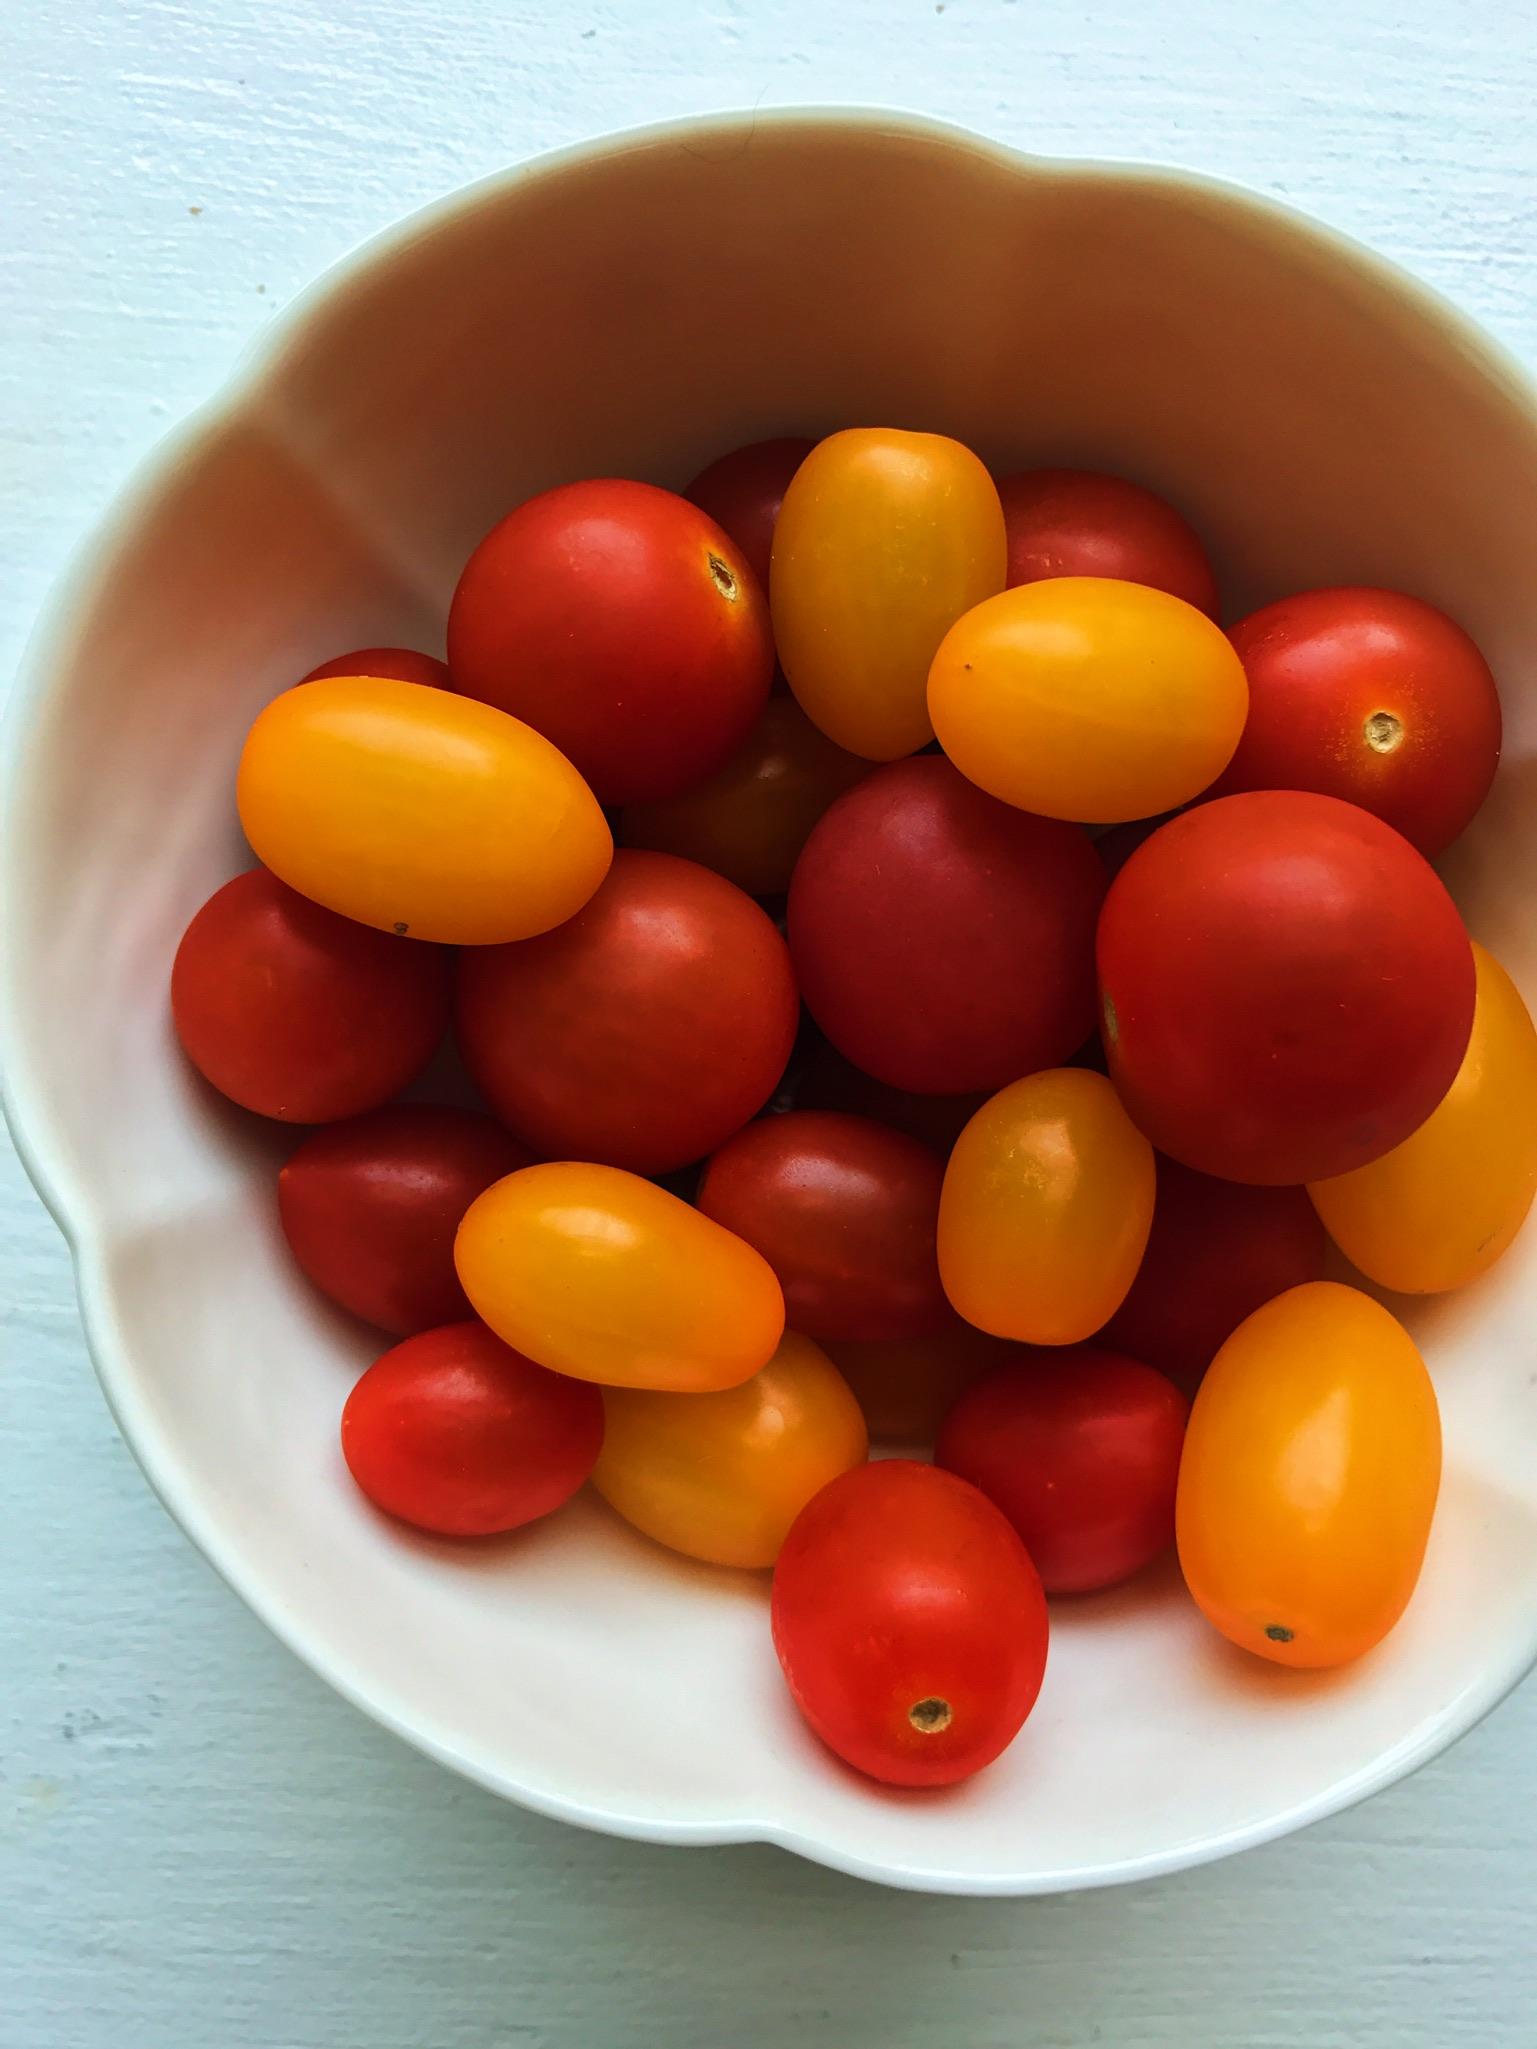 tomato 1.JPG